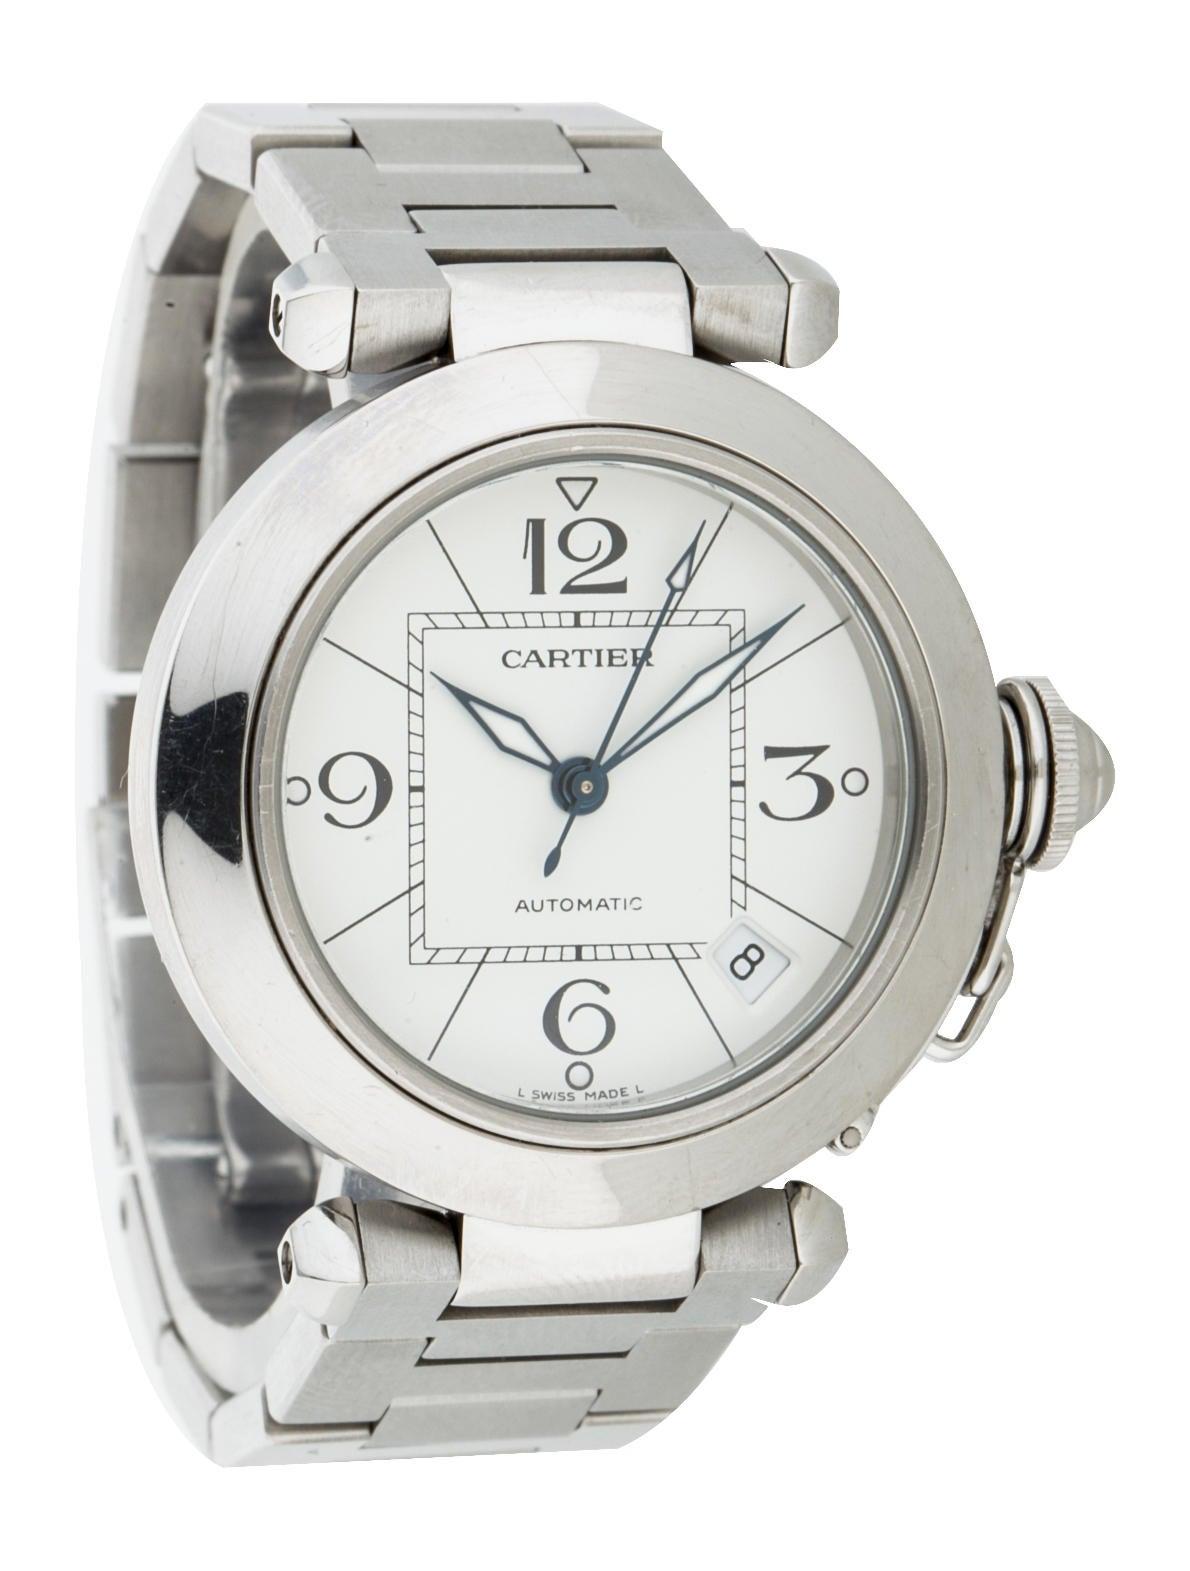 Cartier Pasha De Cartier 2324 Watch - Bracelet